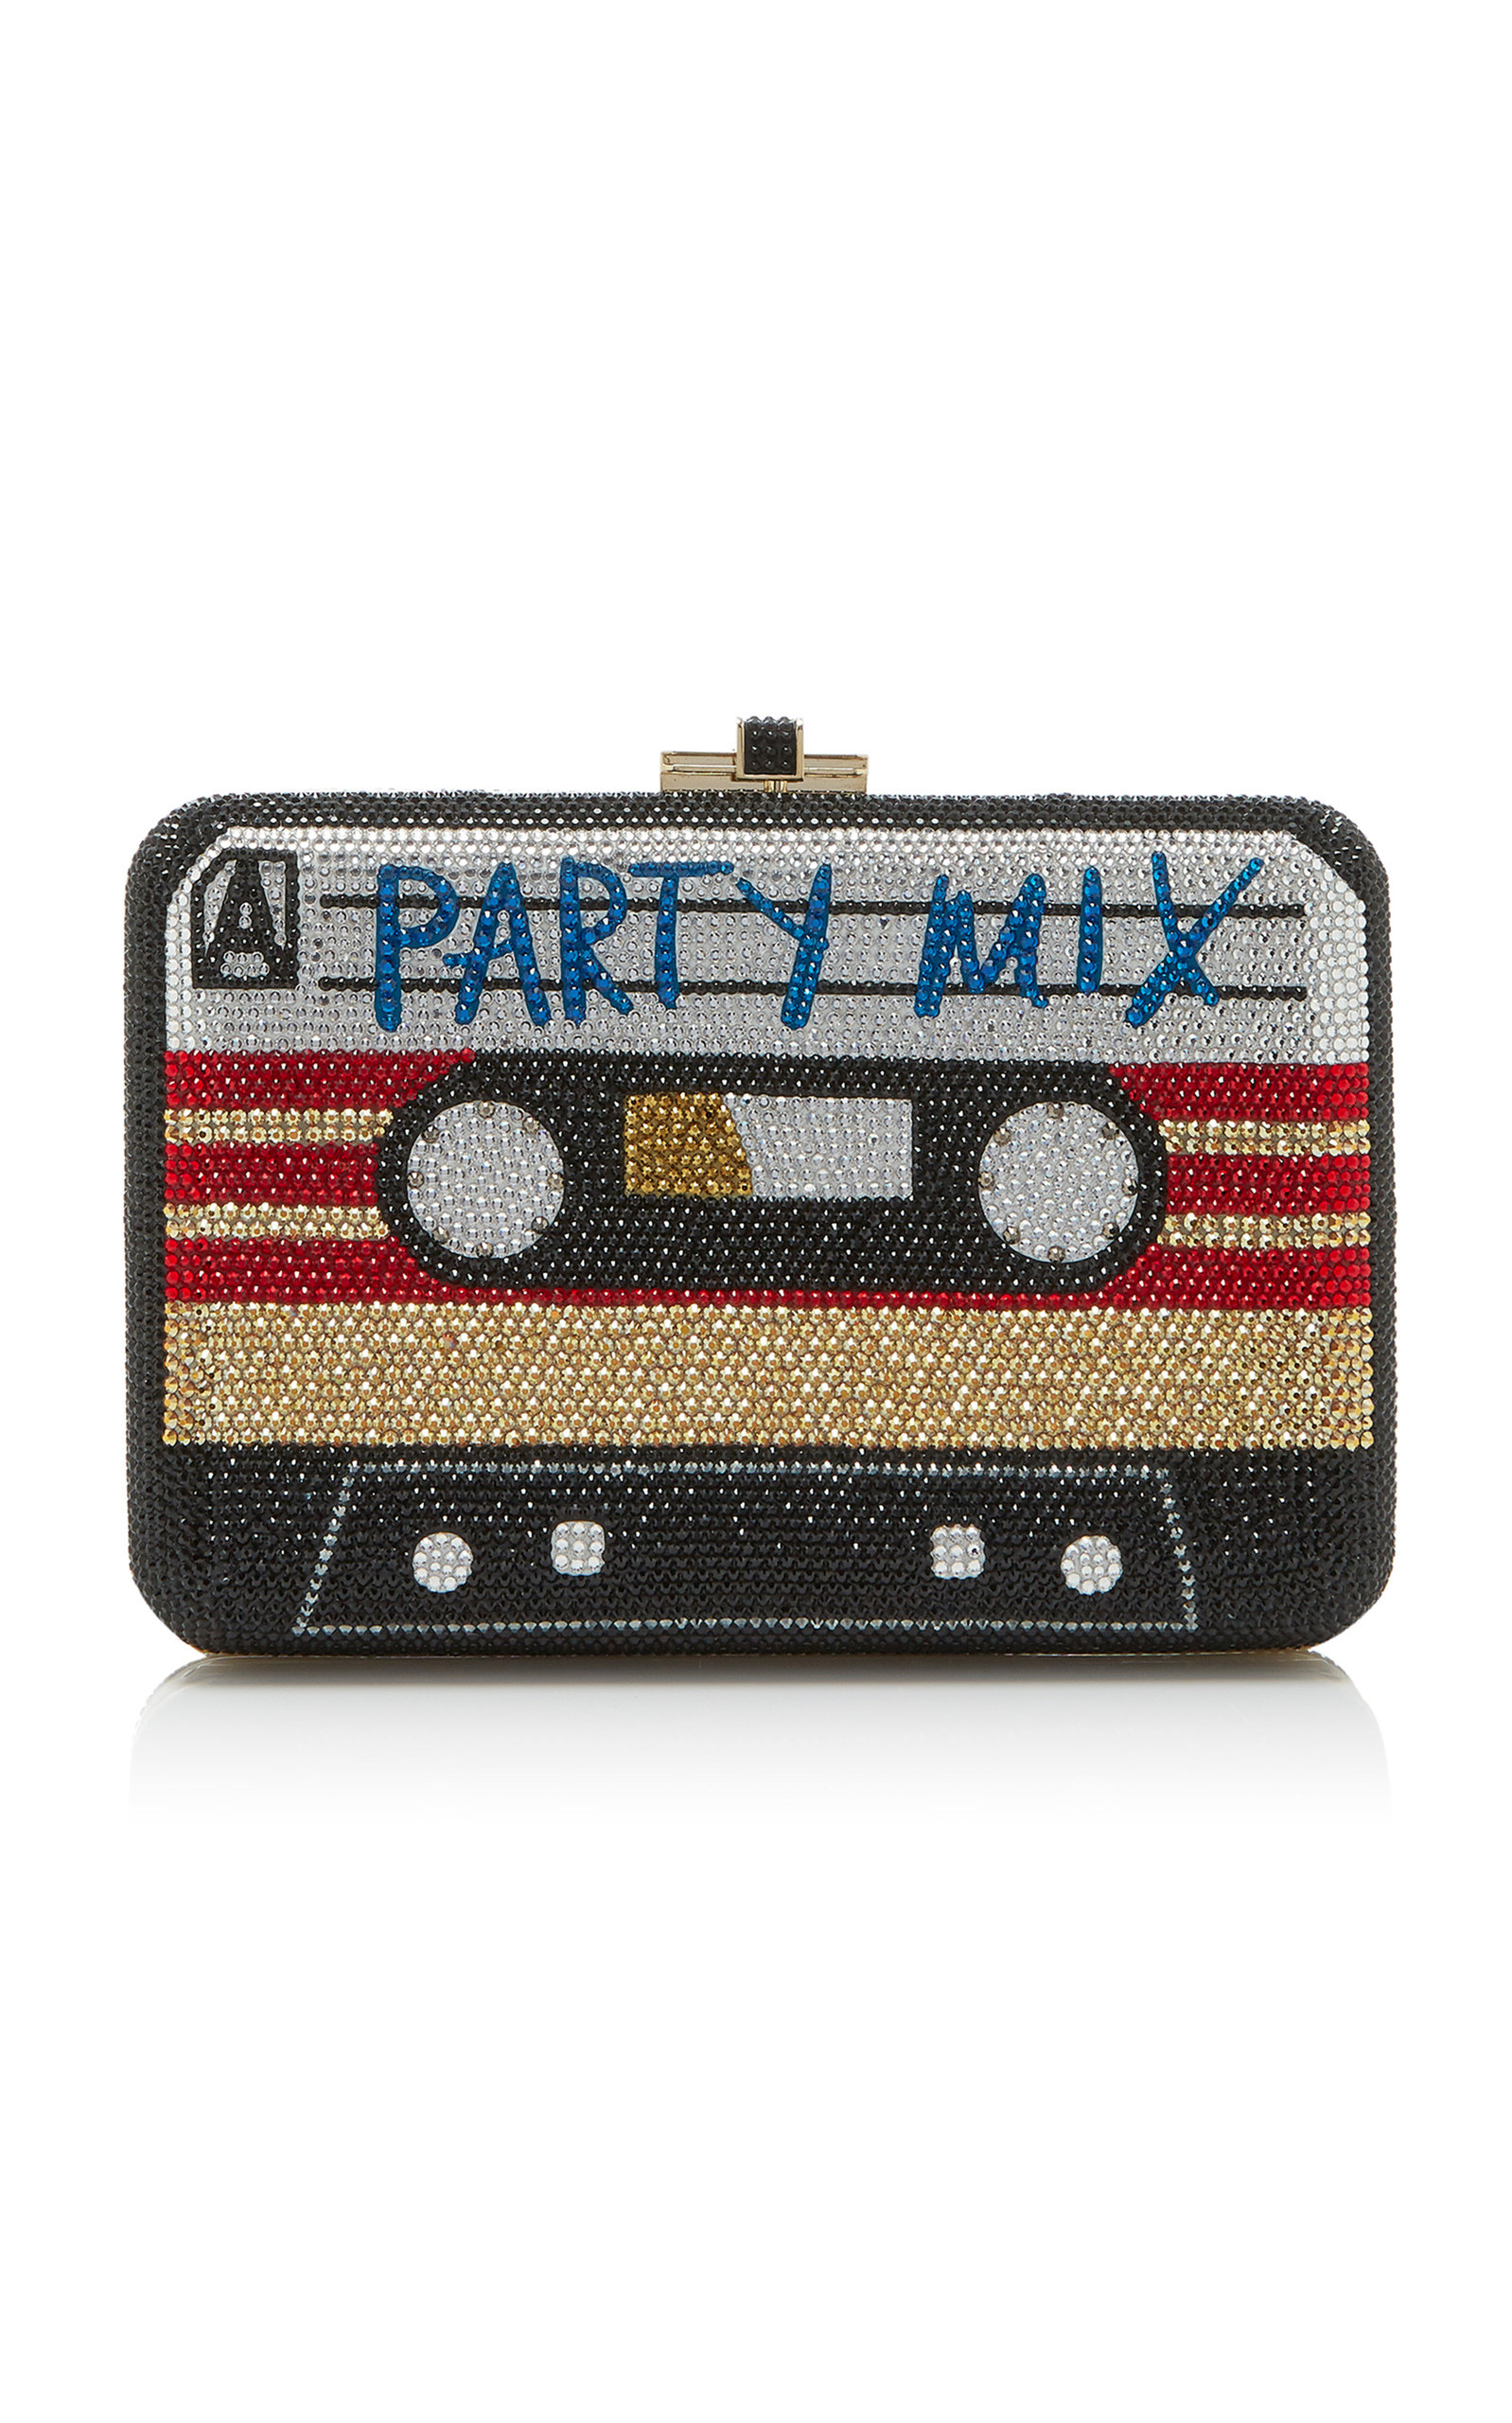 Judith Leiber Party Mix Crystal Clutch 8eNcsq8dB